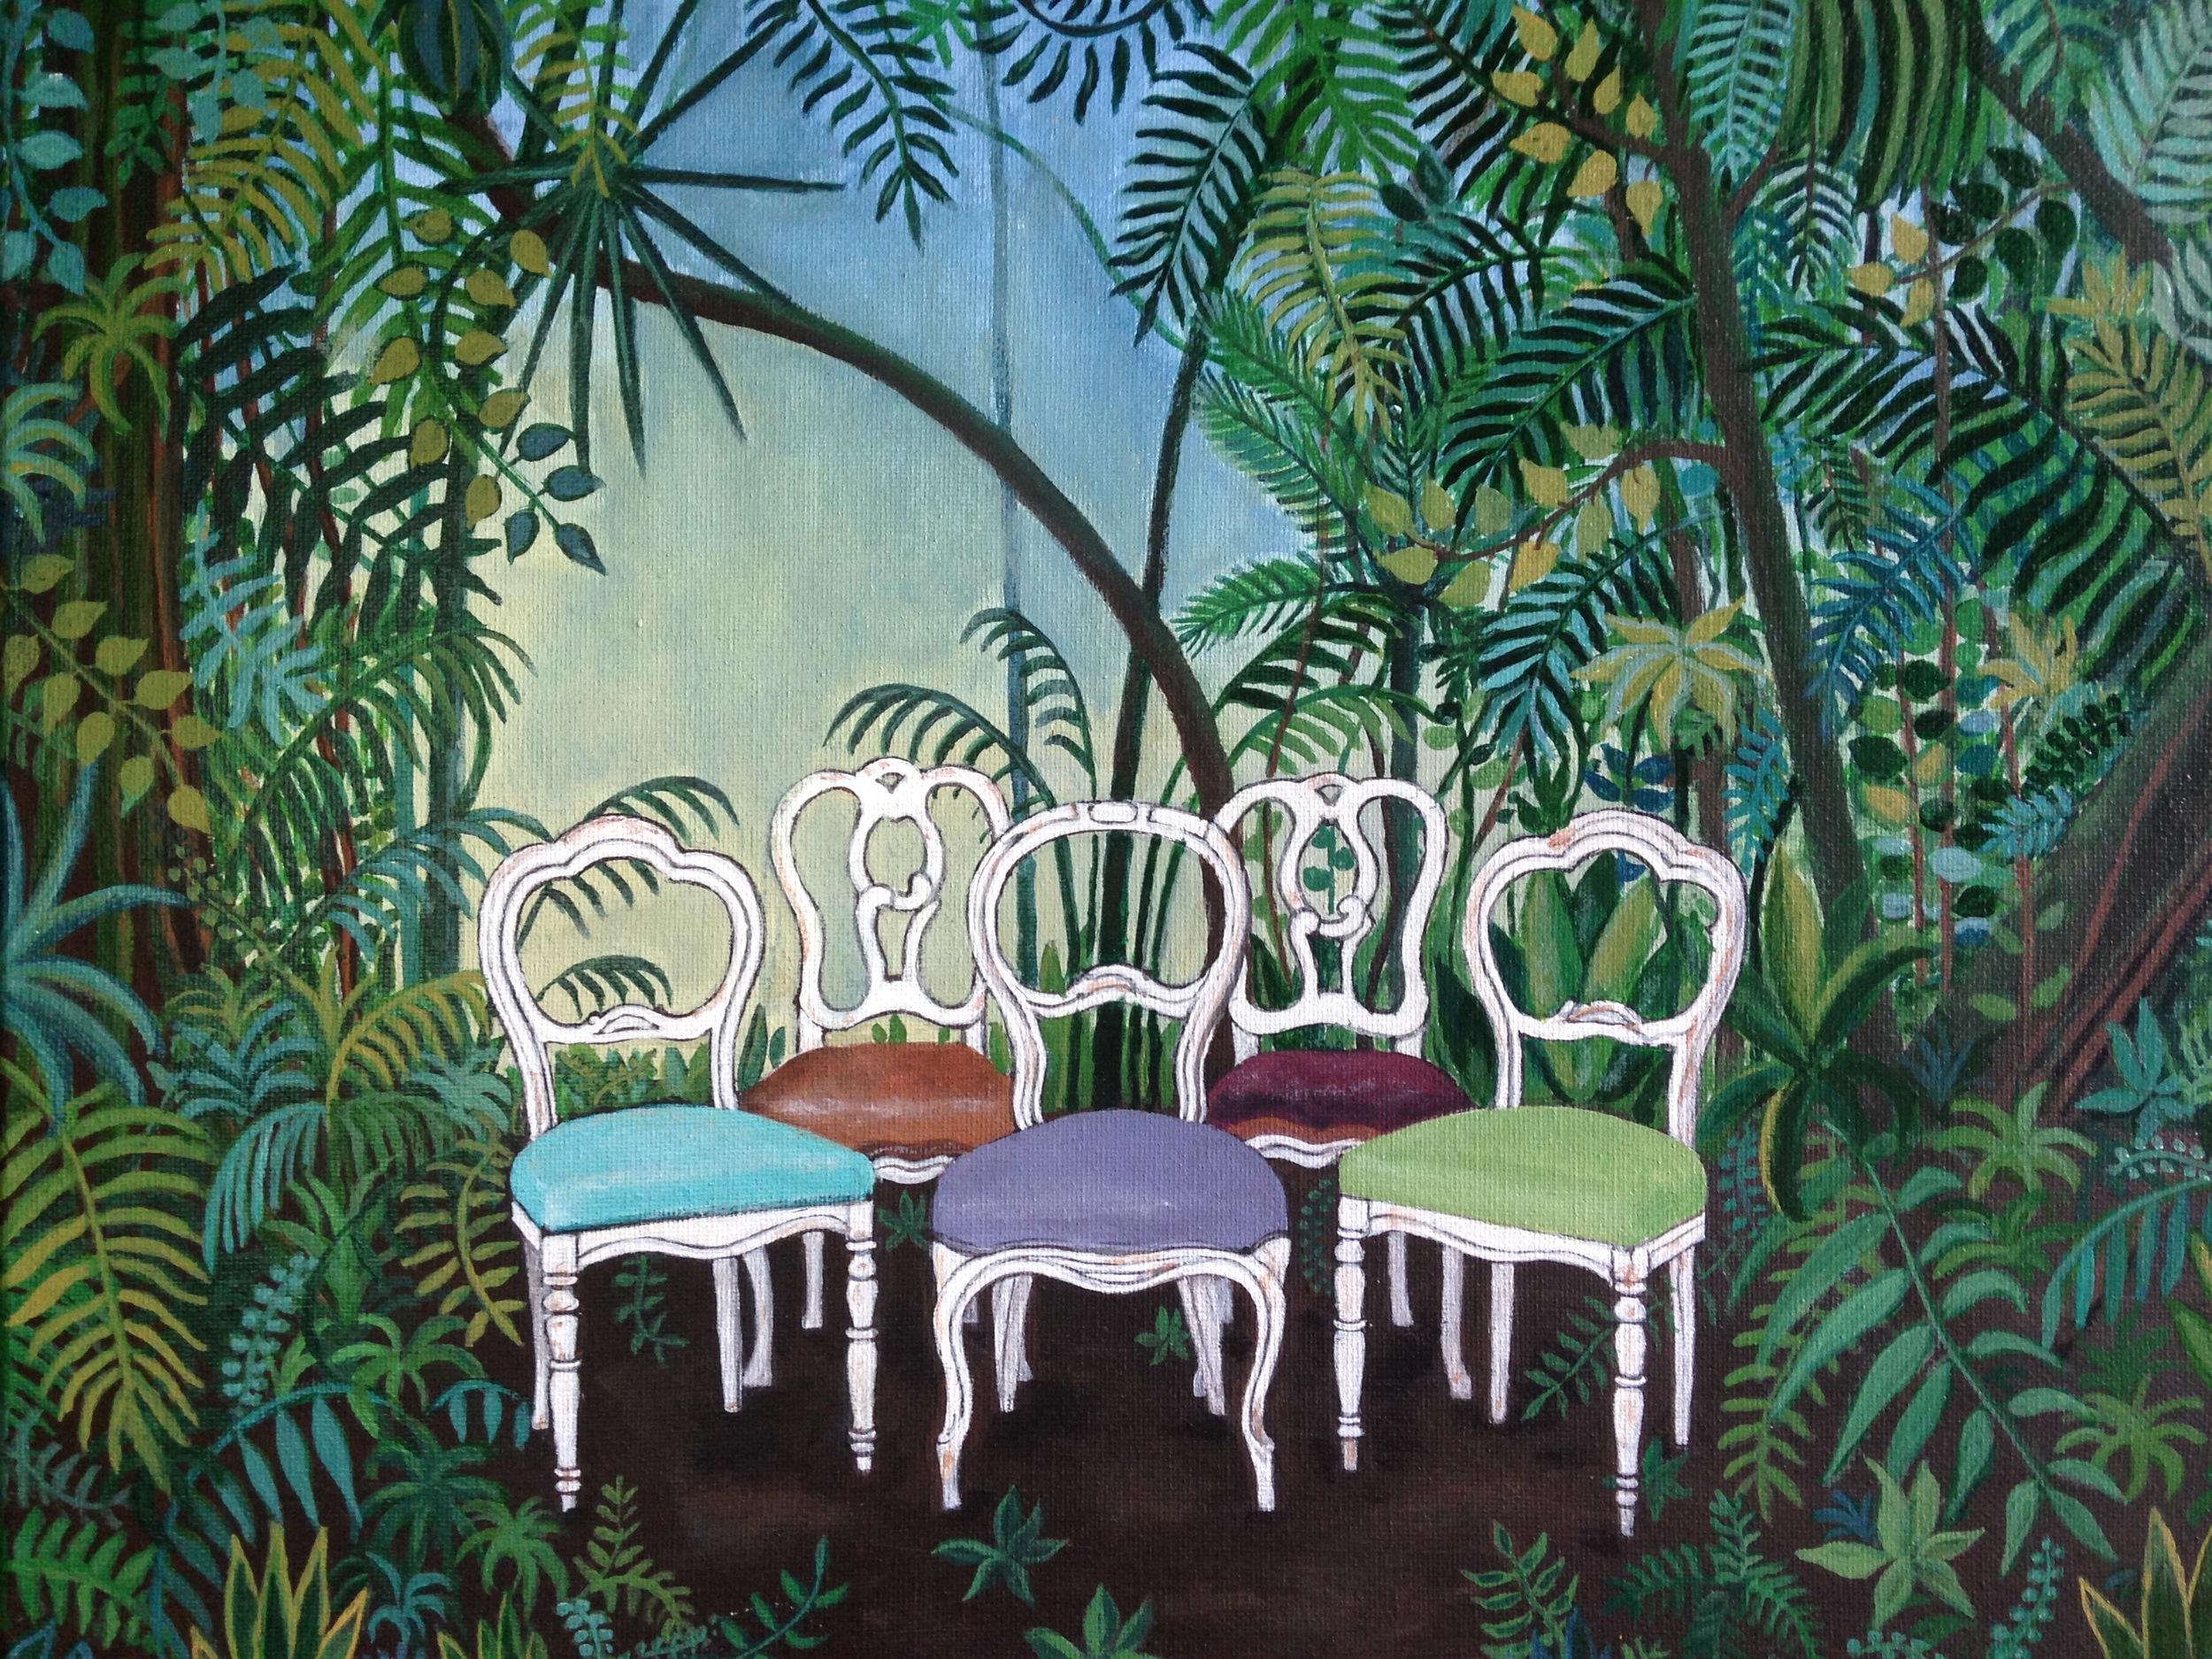 invitation to the jungle, 12''x16'', acrylic on canvas, 2016